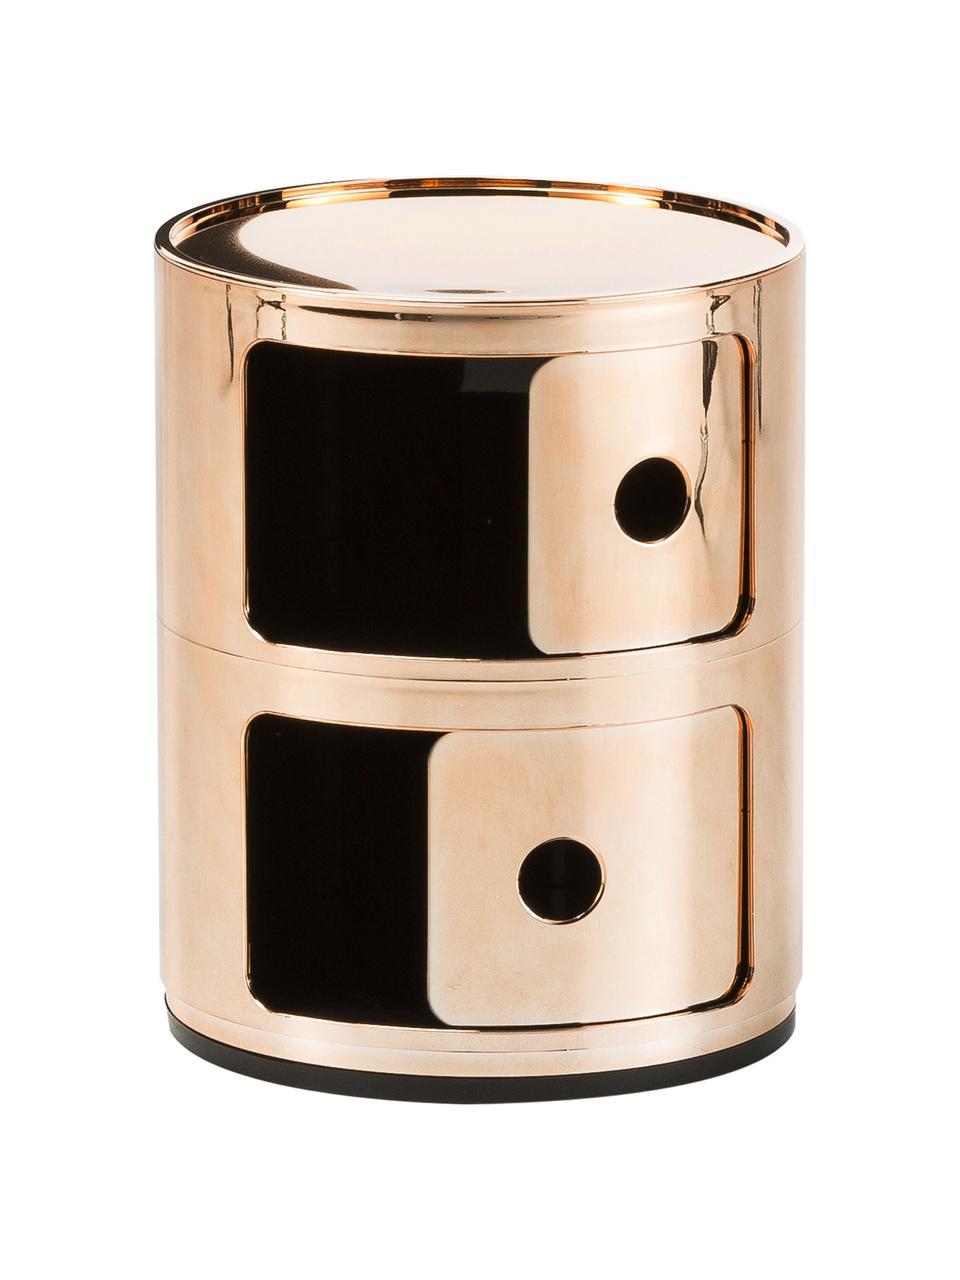 Design Container Componibili 2 Modules, Kunststoff (ABS), lackiert, Kupferfarben, Ø 32 x H 40 cm